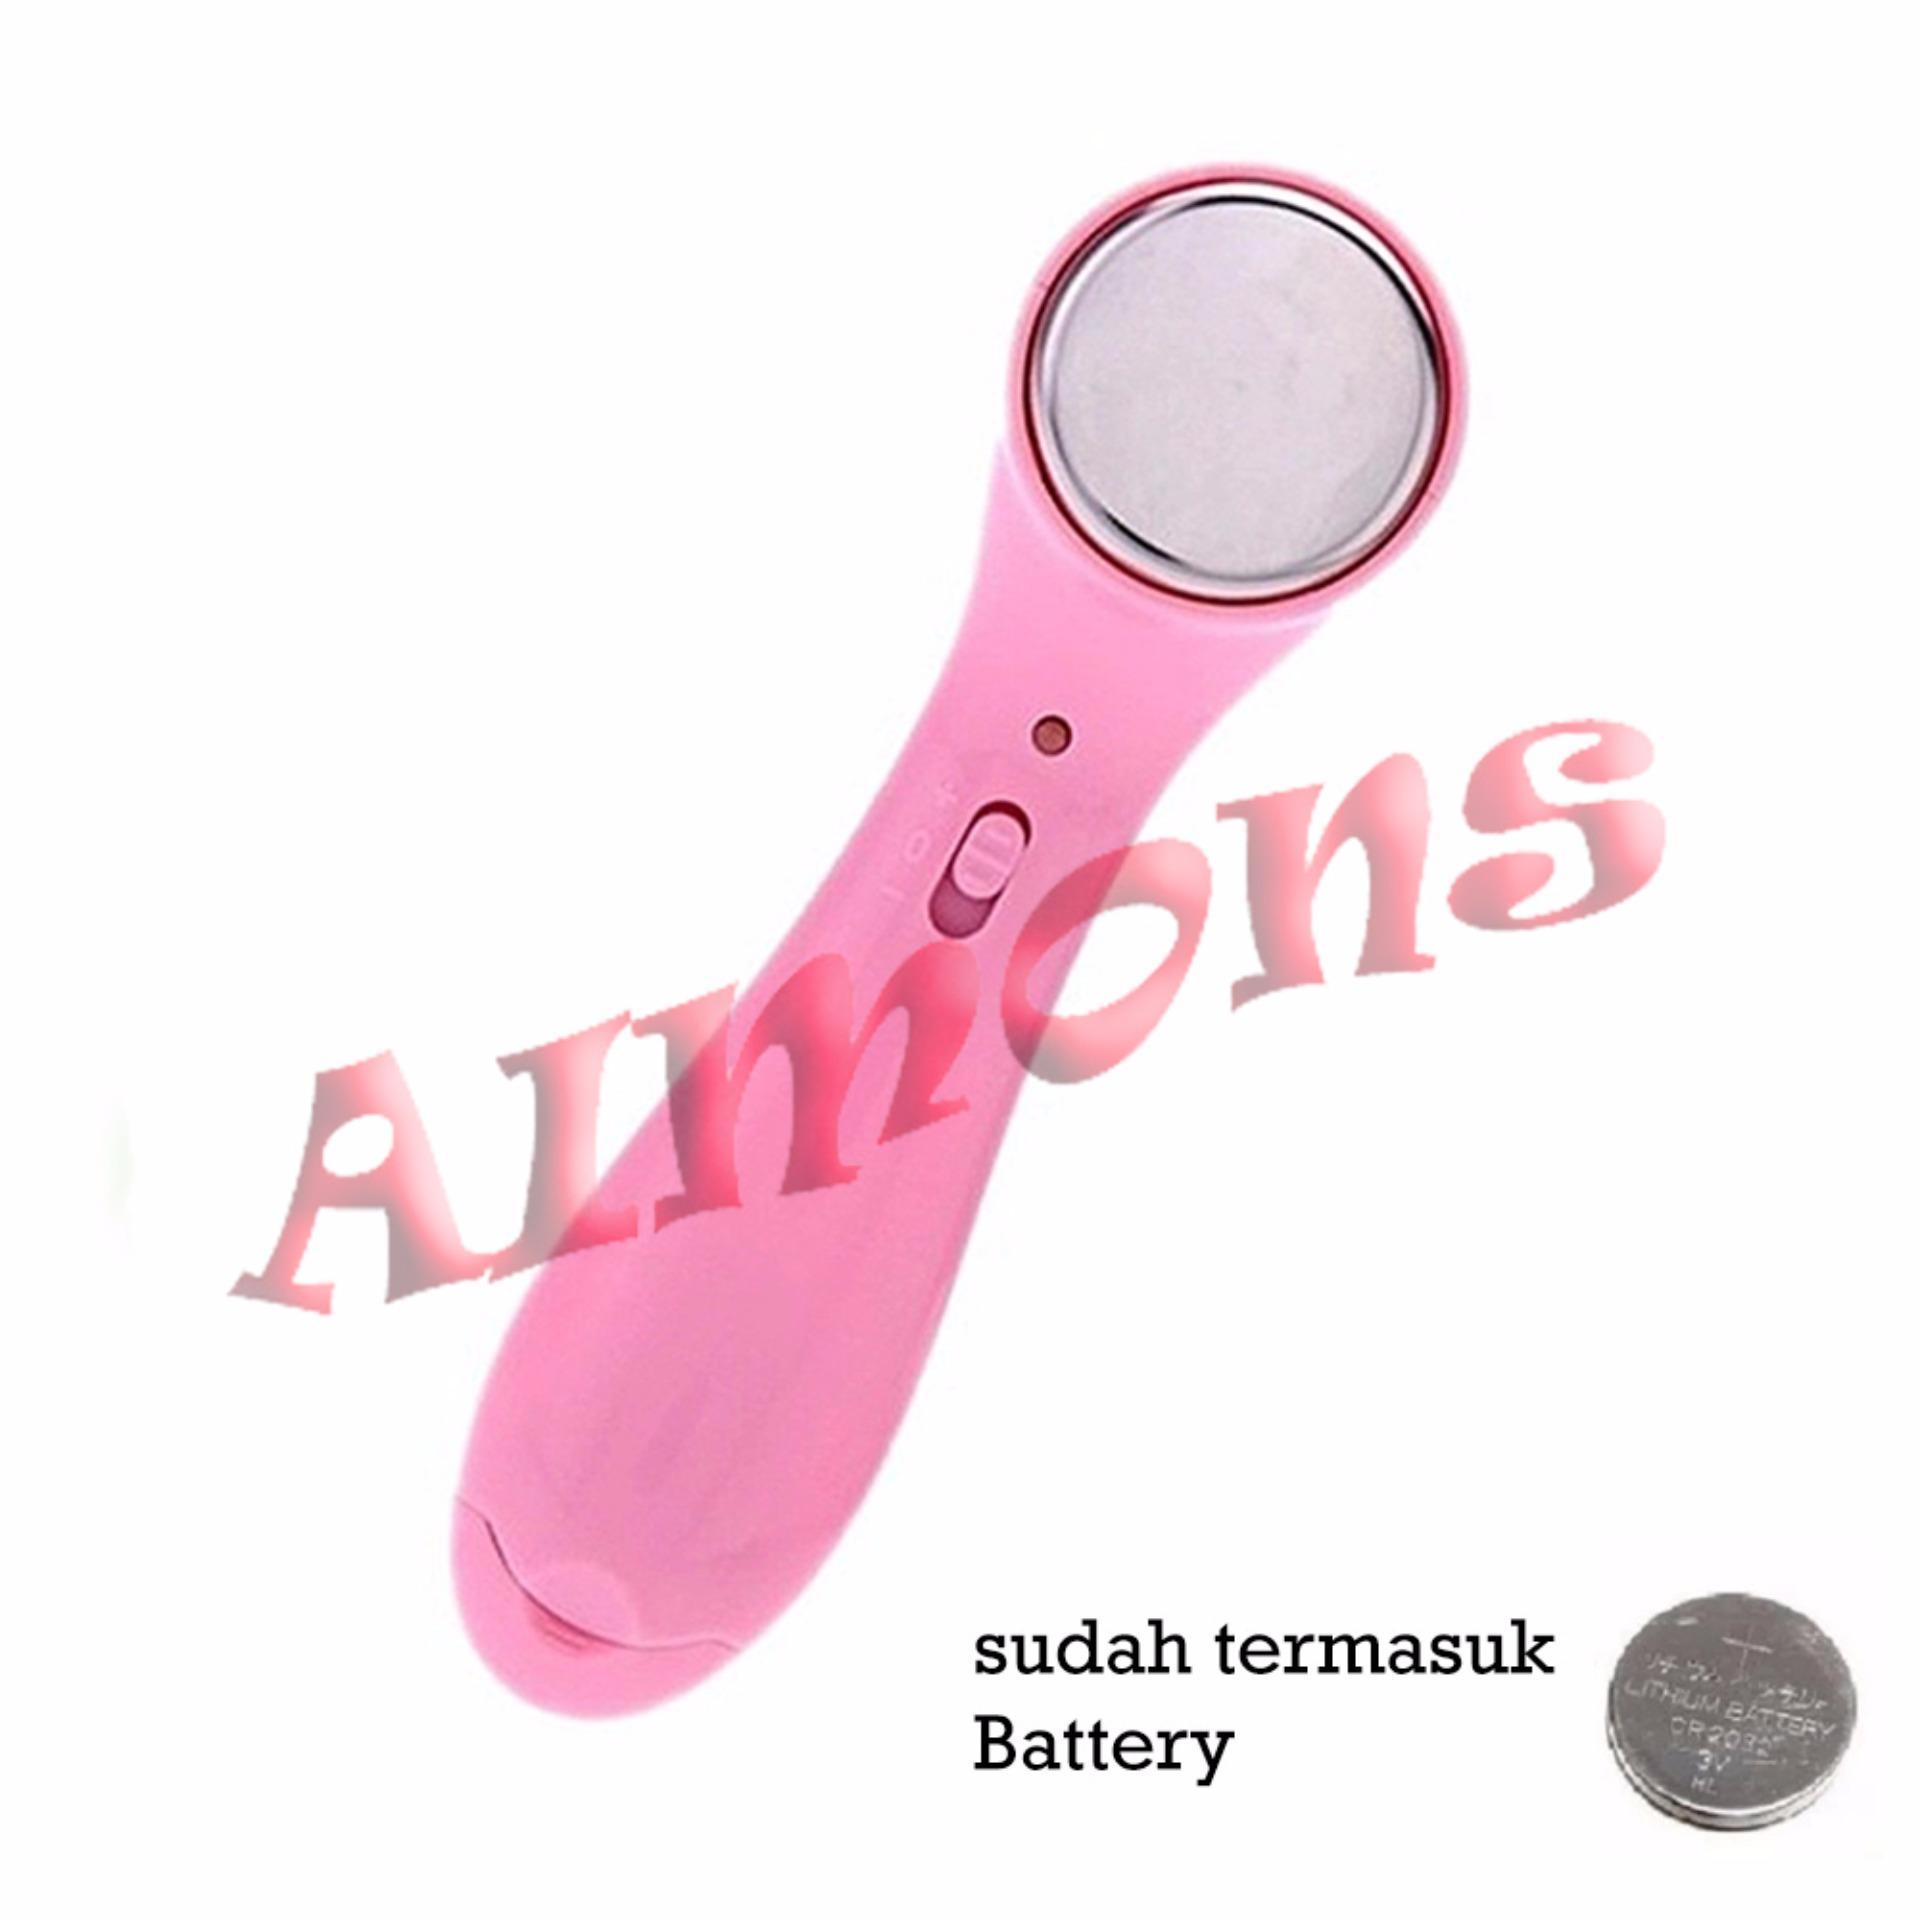 S2 Kn Setrika Wajah Ionic Pink Beli Harga Murah Ion Massager Mawar88shop Ultrasonic Face Cleanse Source